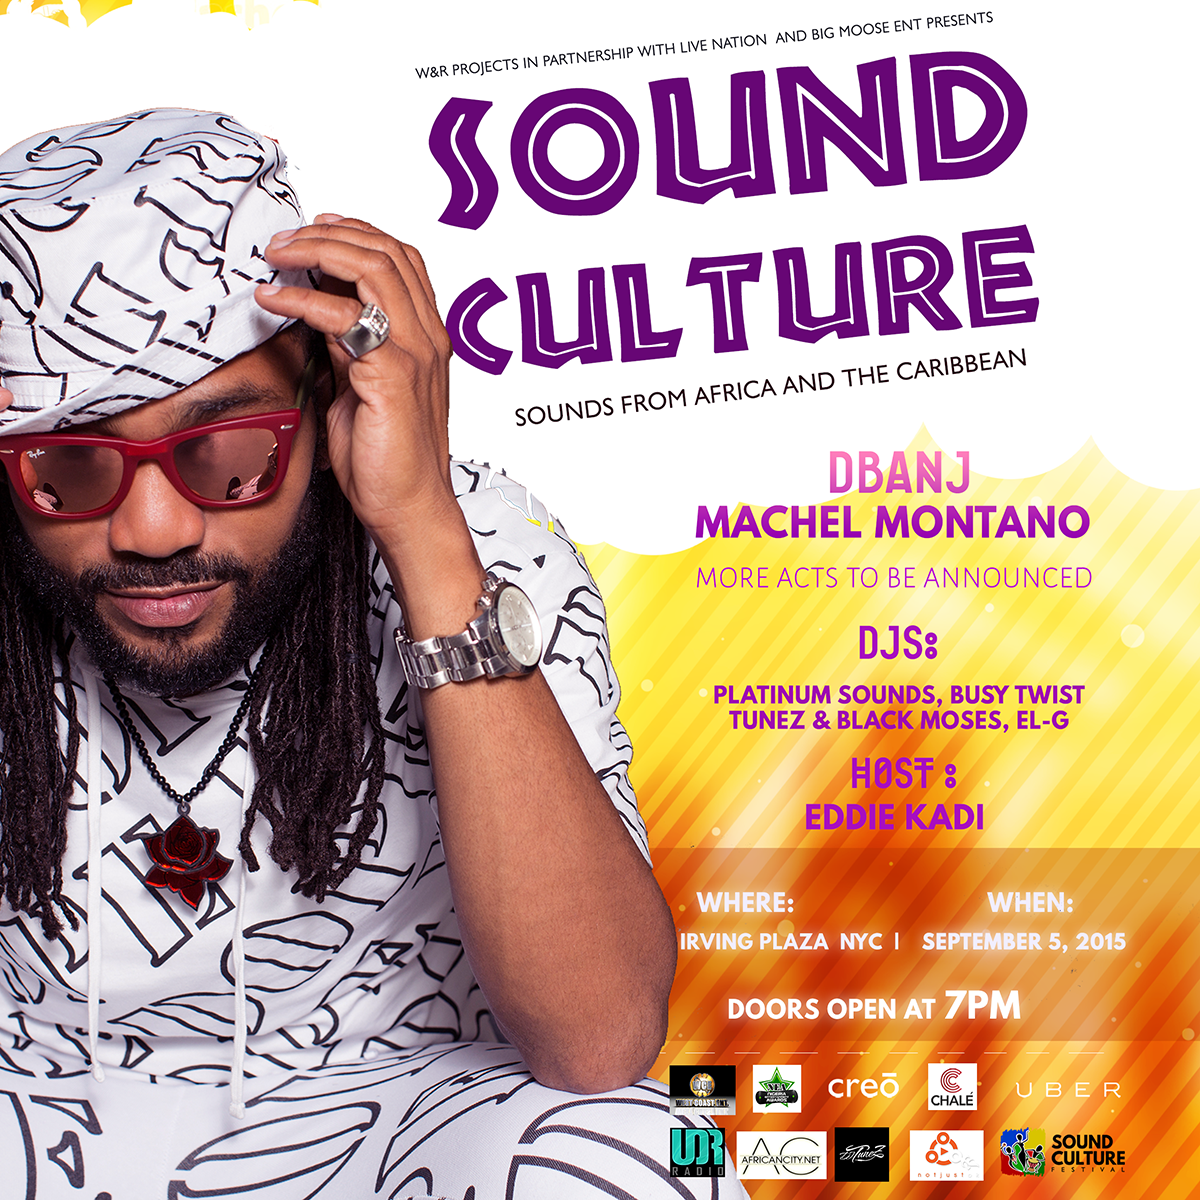 Sound Culture 1